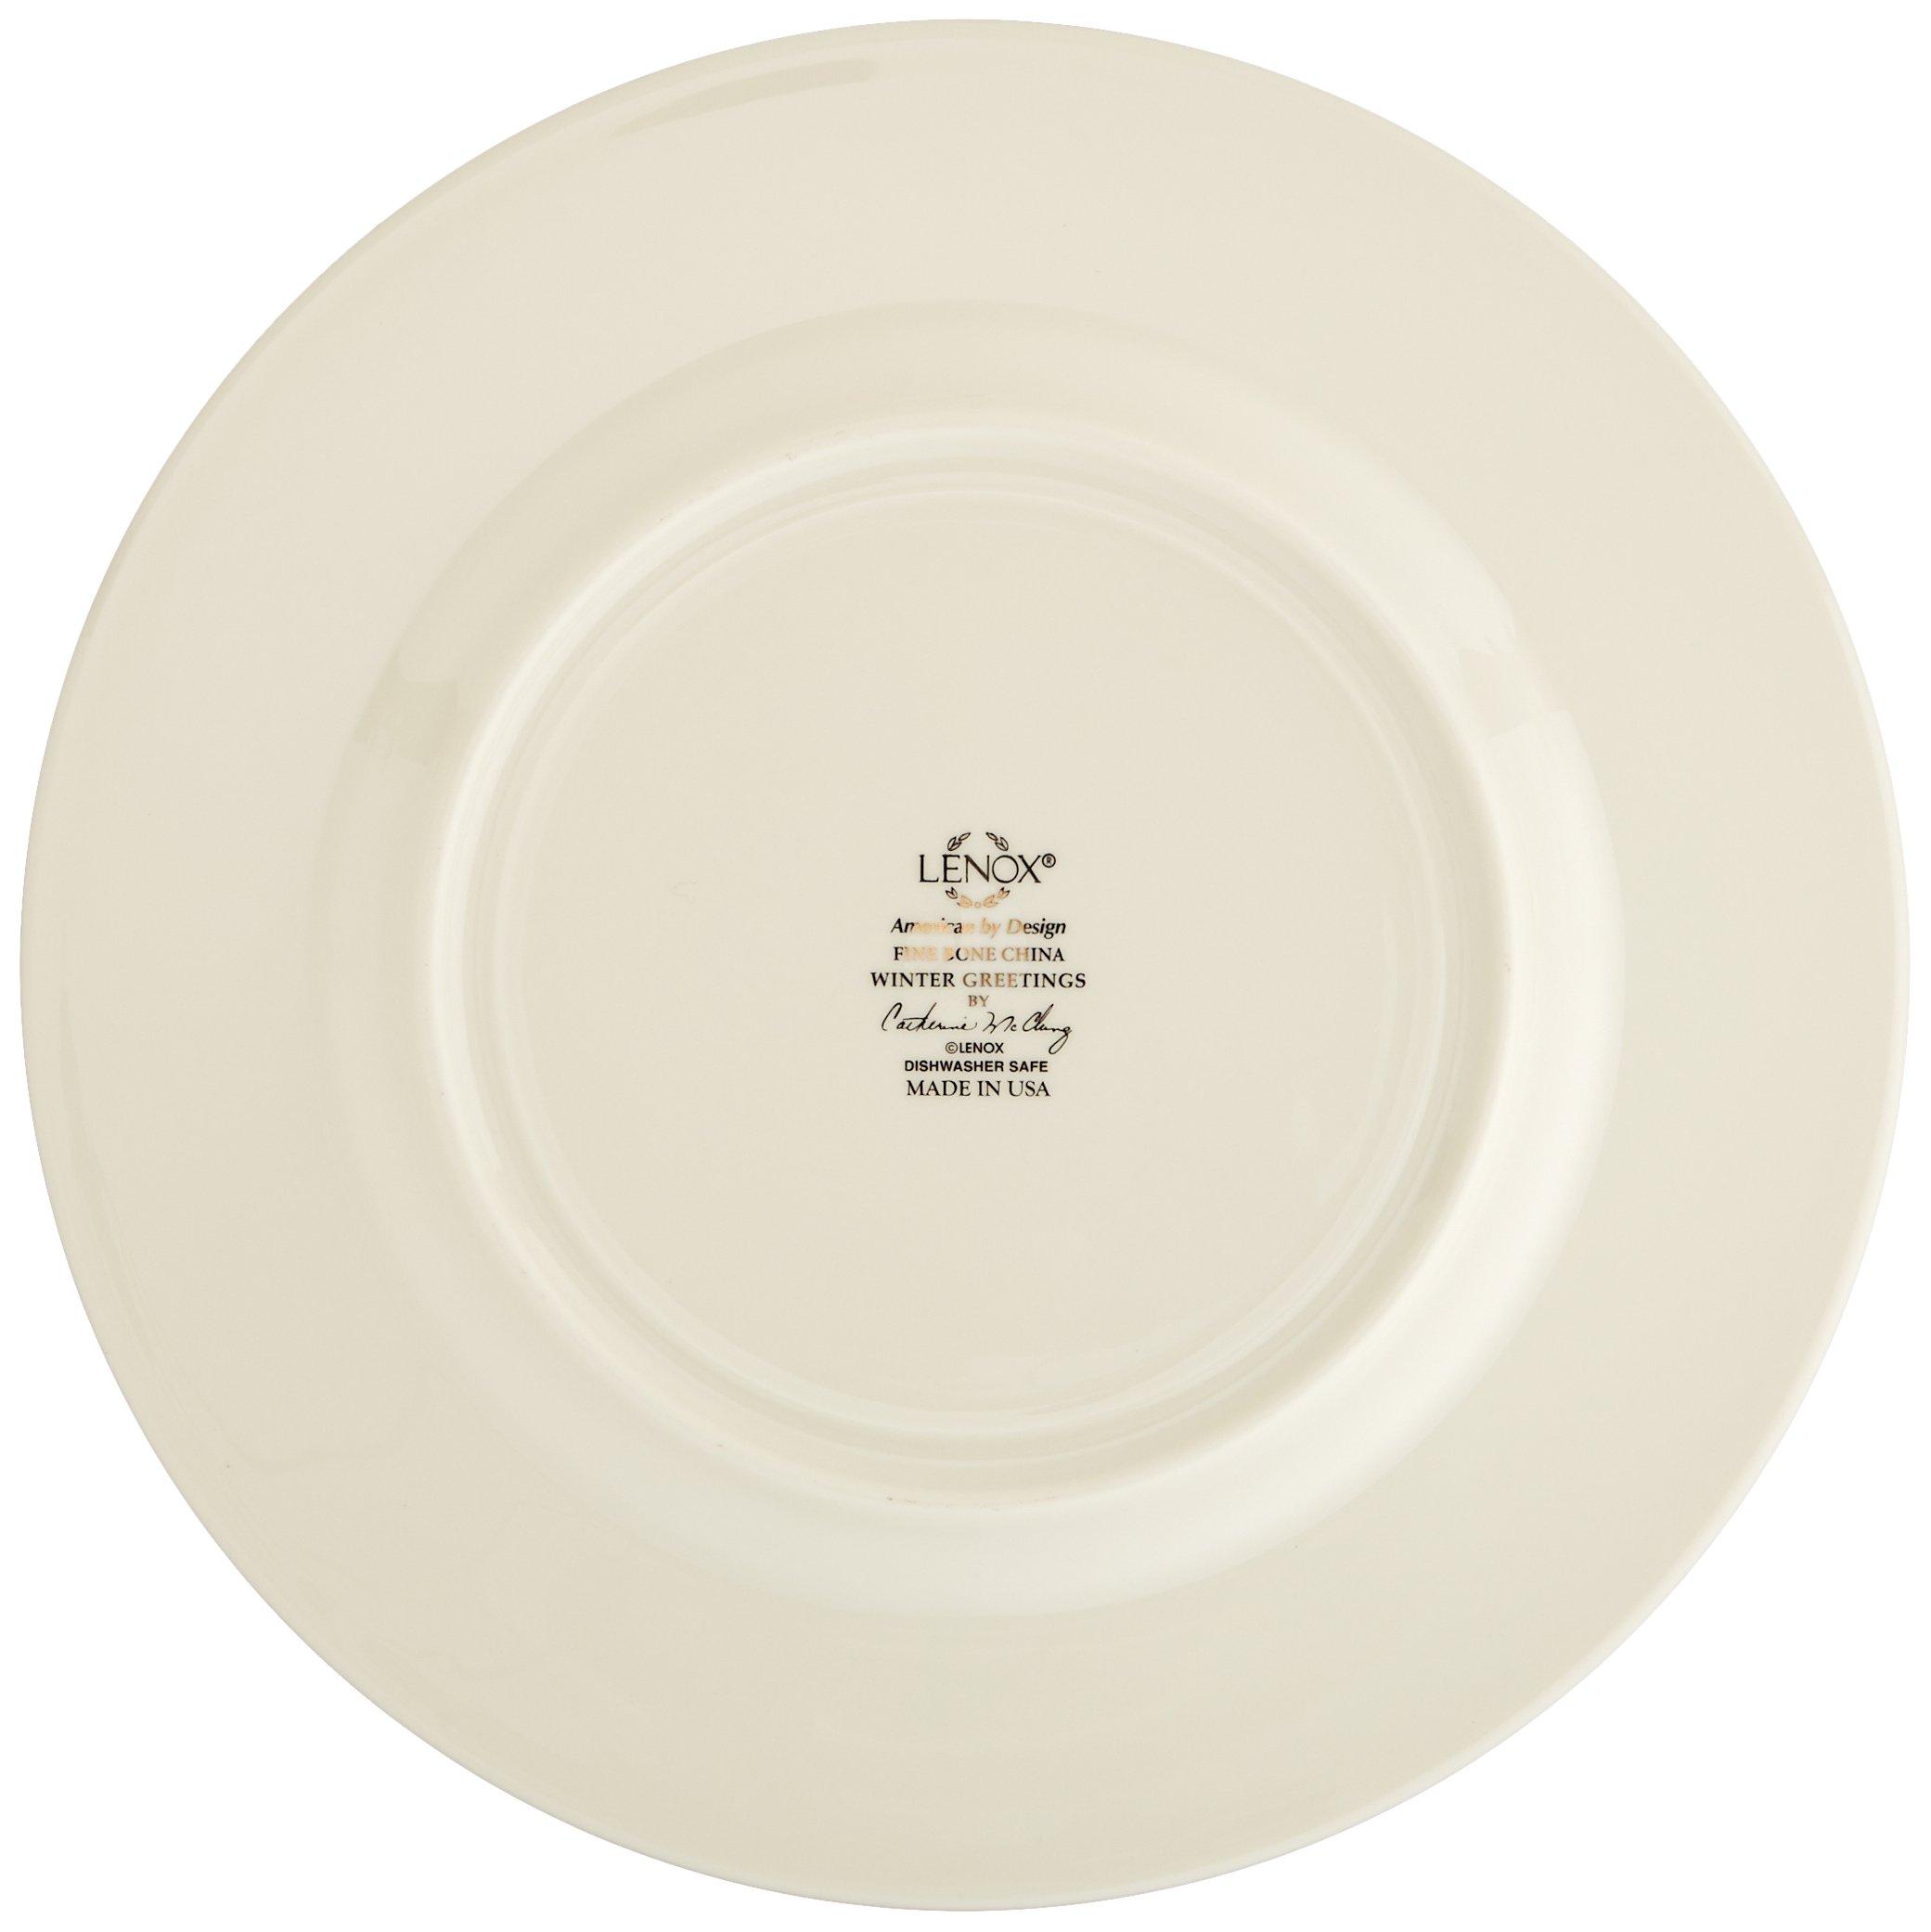 Lenox Winter Greetings Set of 6 Salad Plates,Ivory by Lenox (Image #5)